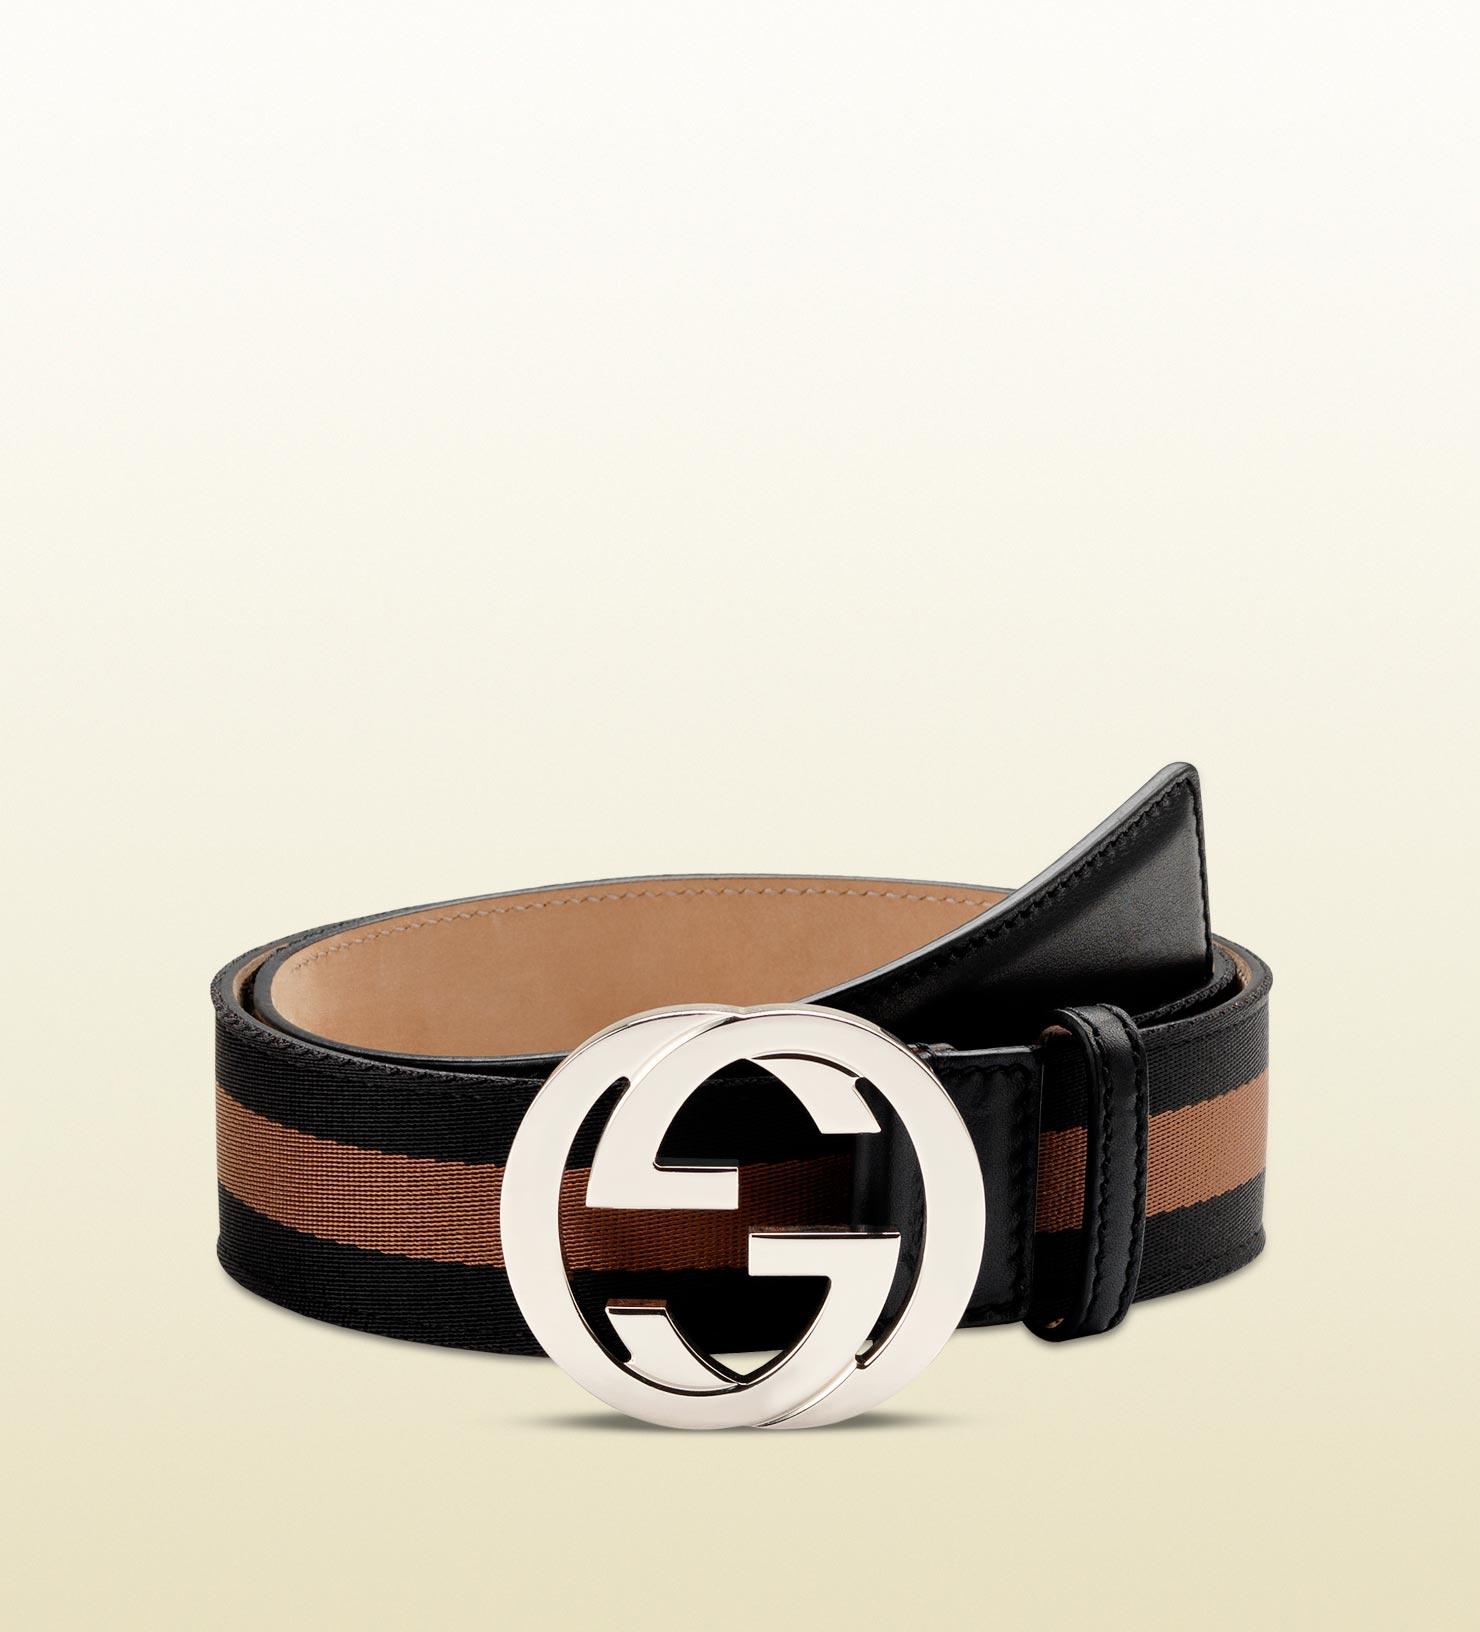 gucci belt with interlocking g buckle in black for men lyst